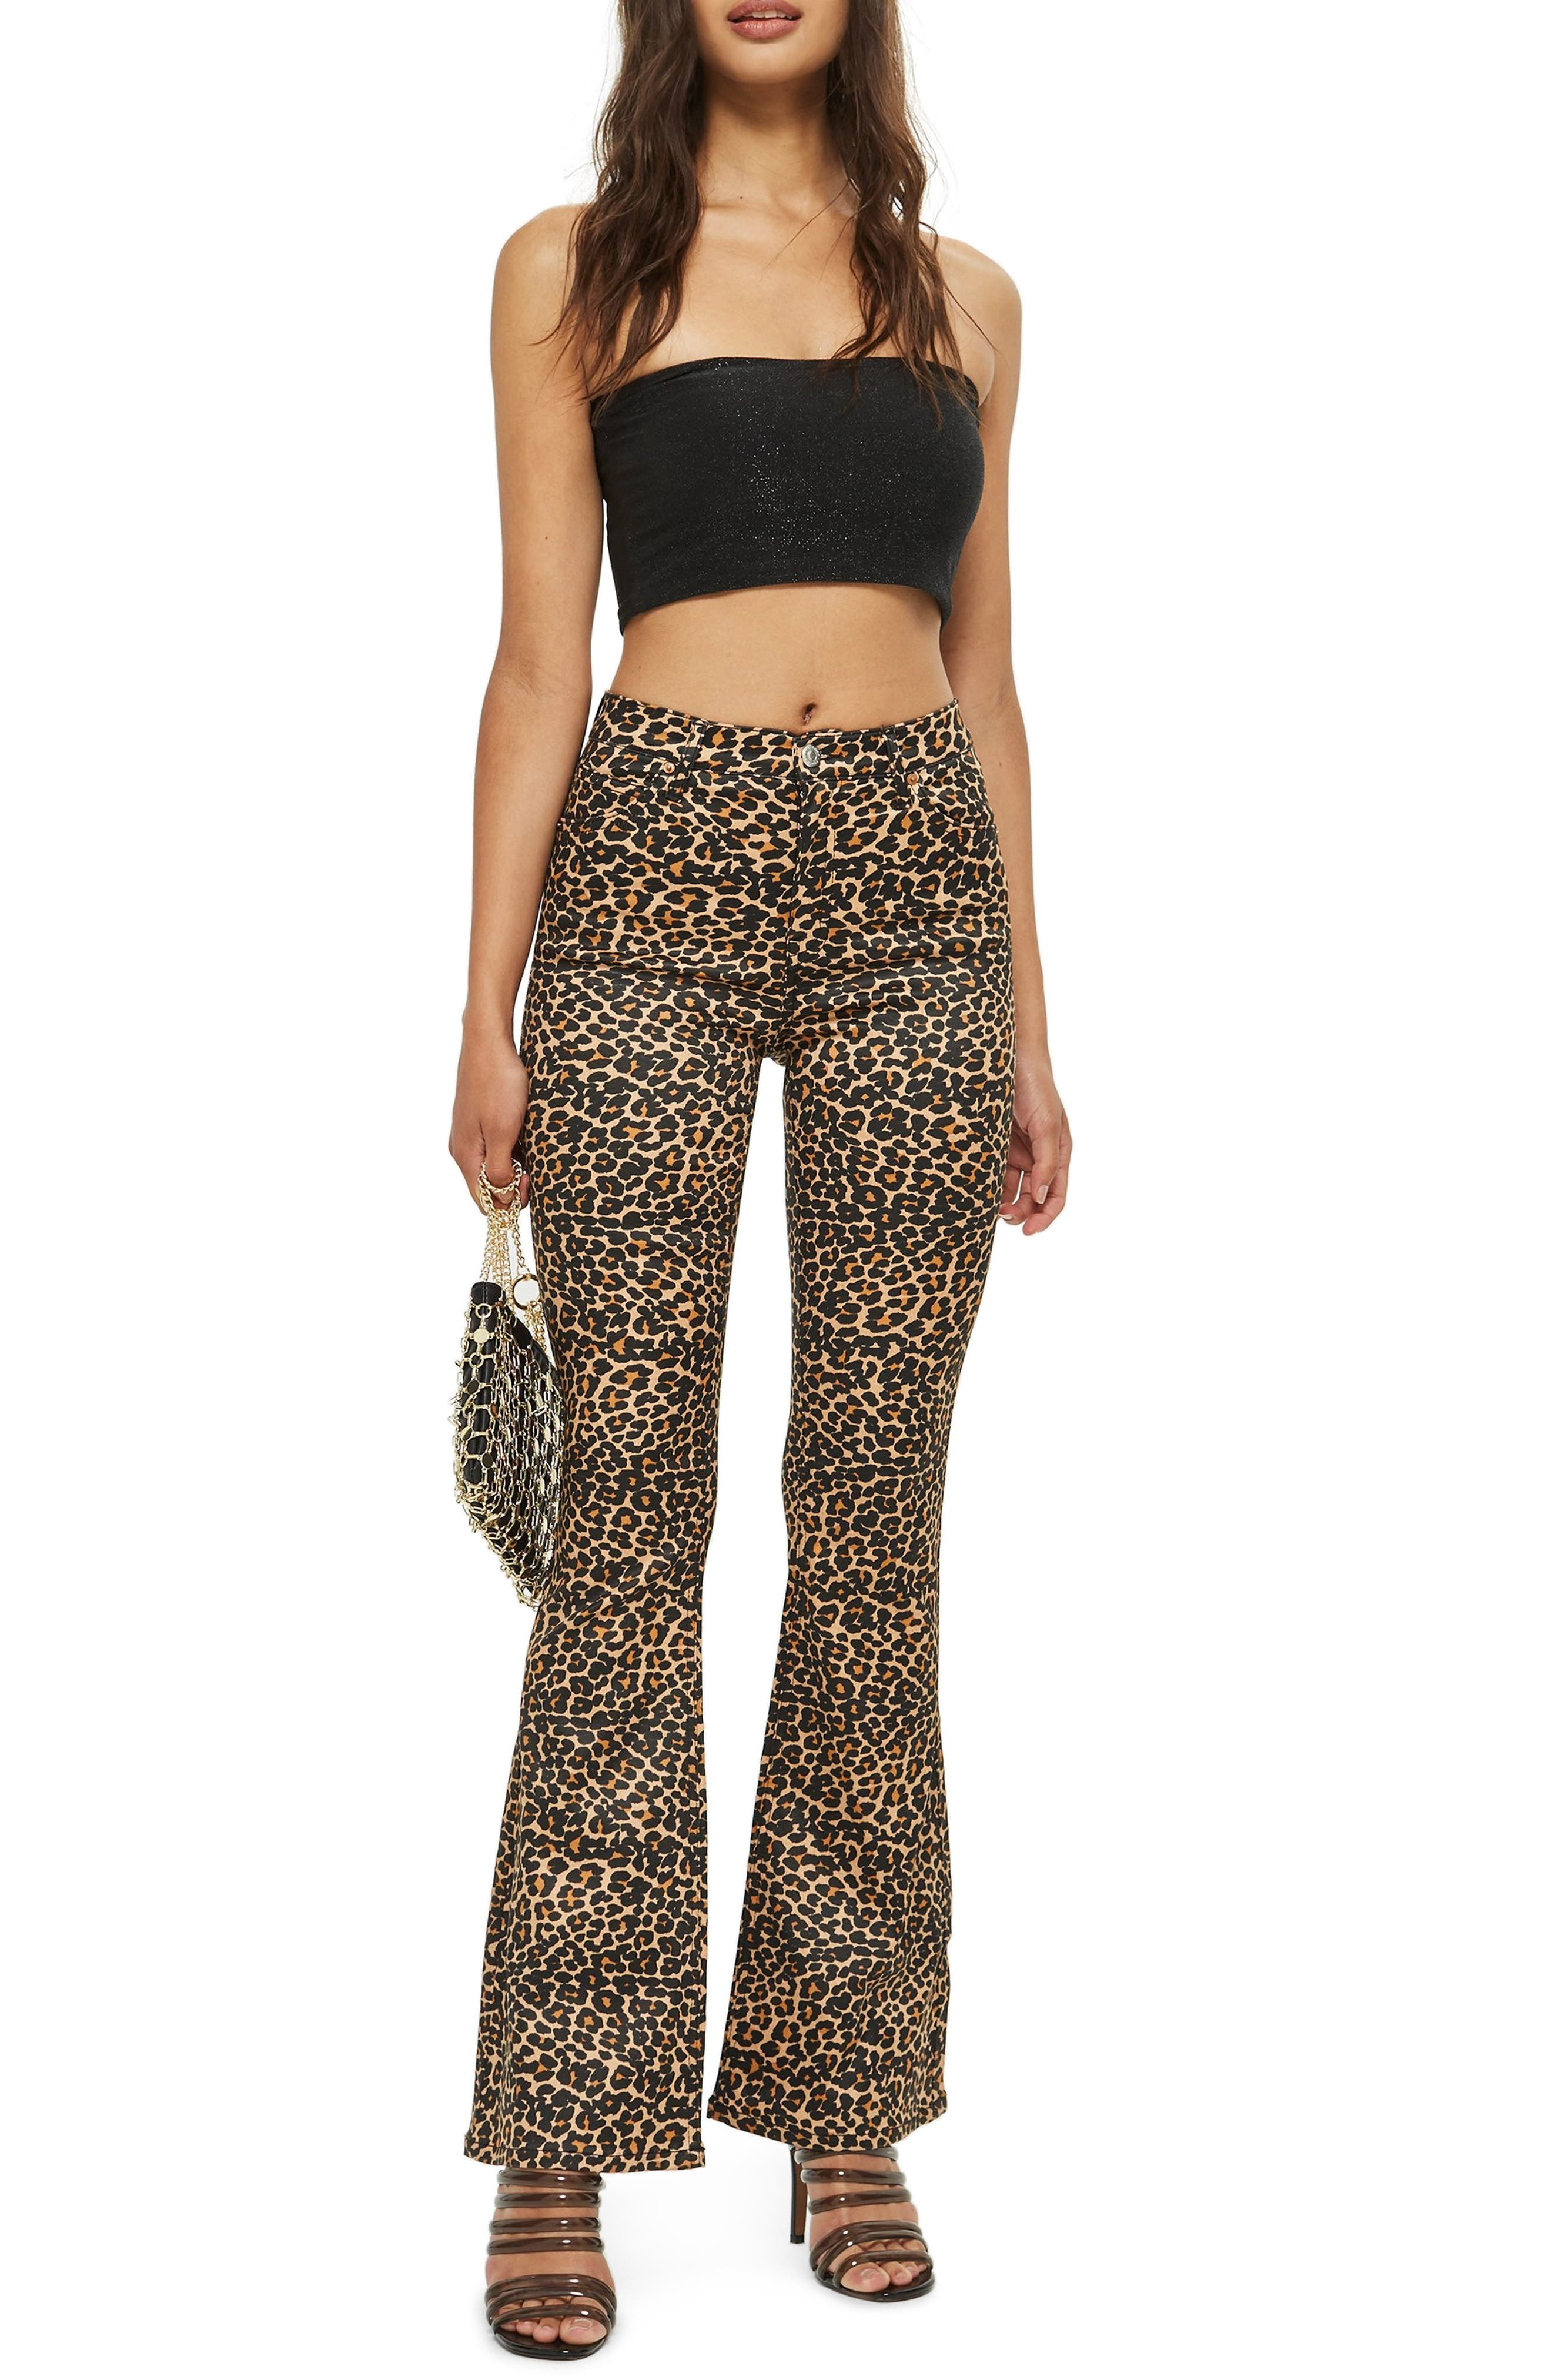 MOTO Leopard Print Flare Jeans,                             Main thumbnail 1, color,                             BROWN MULTI